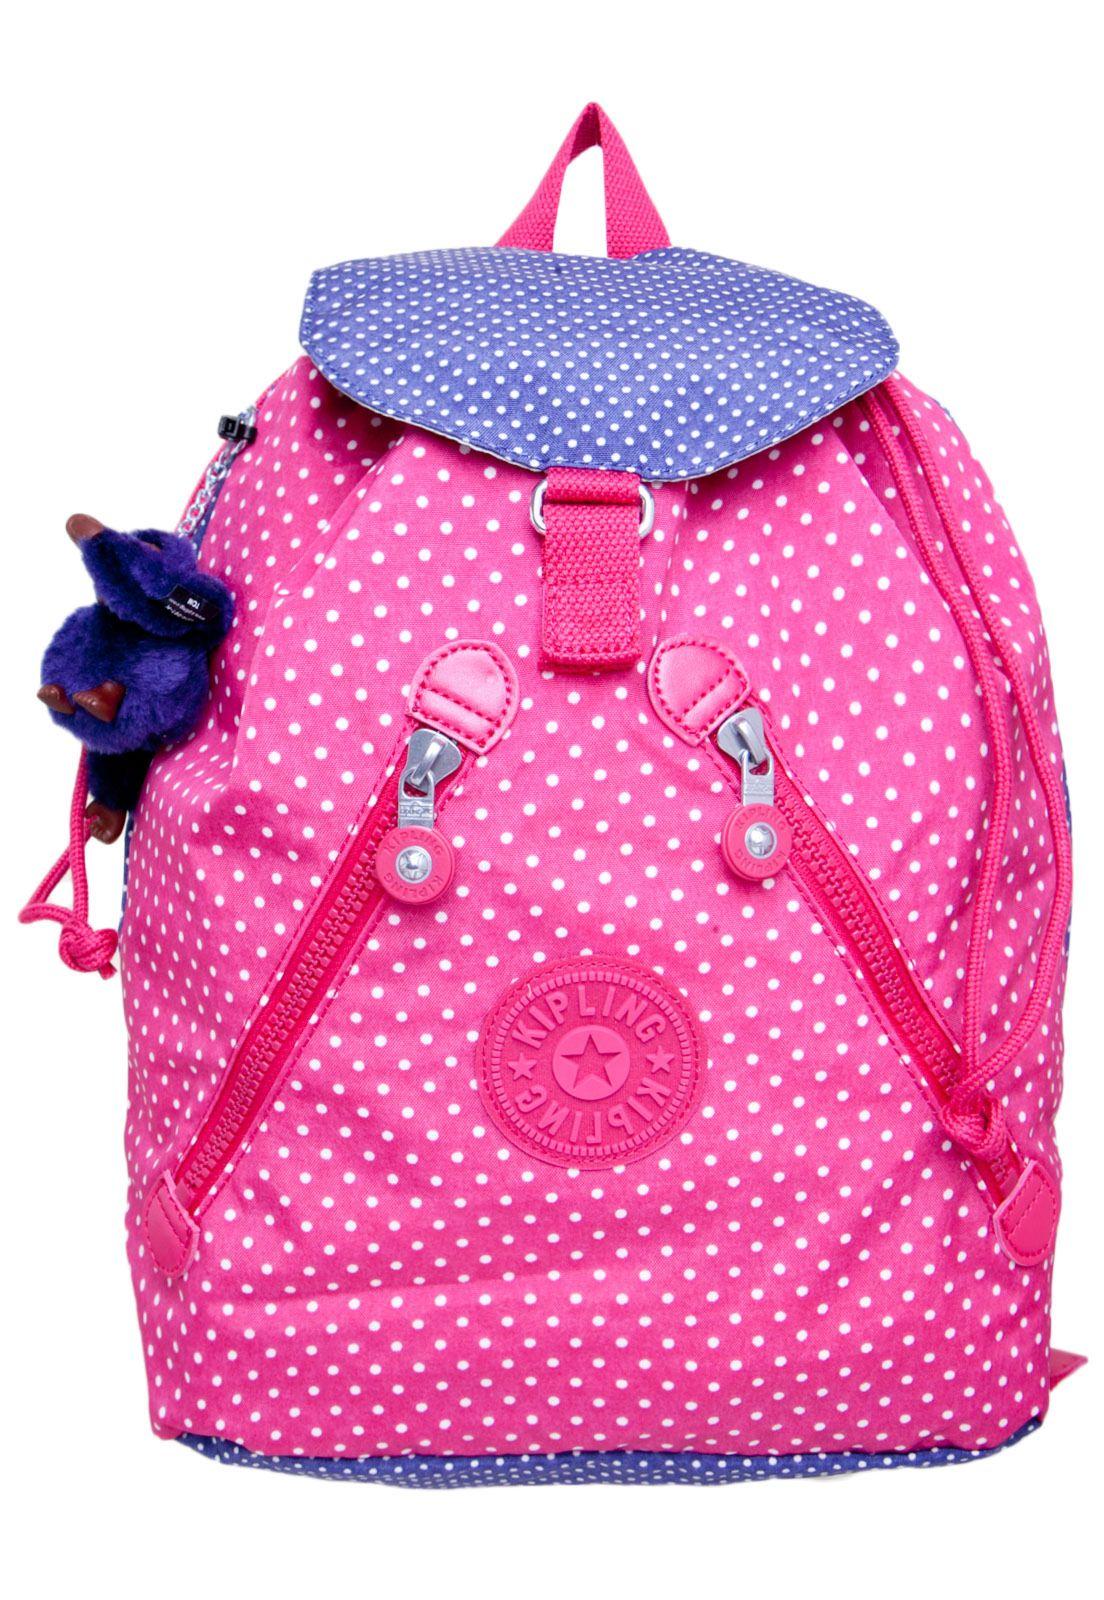 3723a1af0 Mochila Kipling Rosa | Kipling | Kipling bags, Bags e Backpack bags